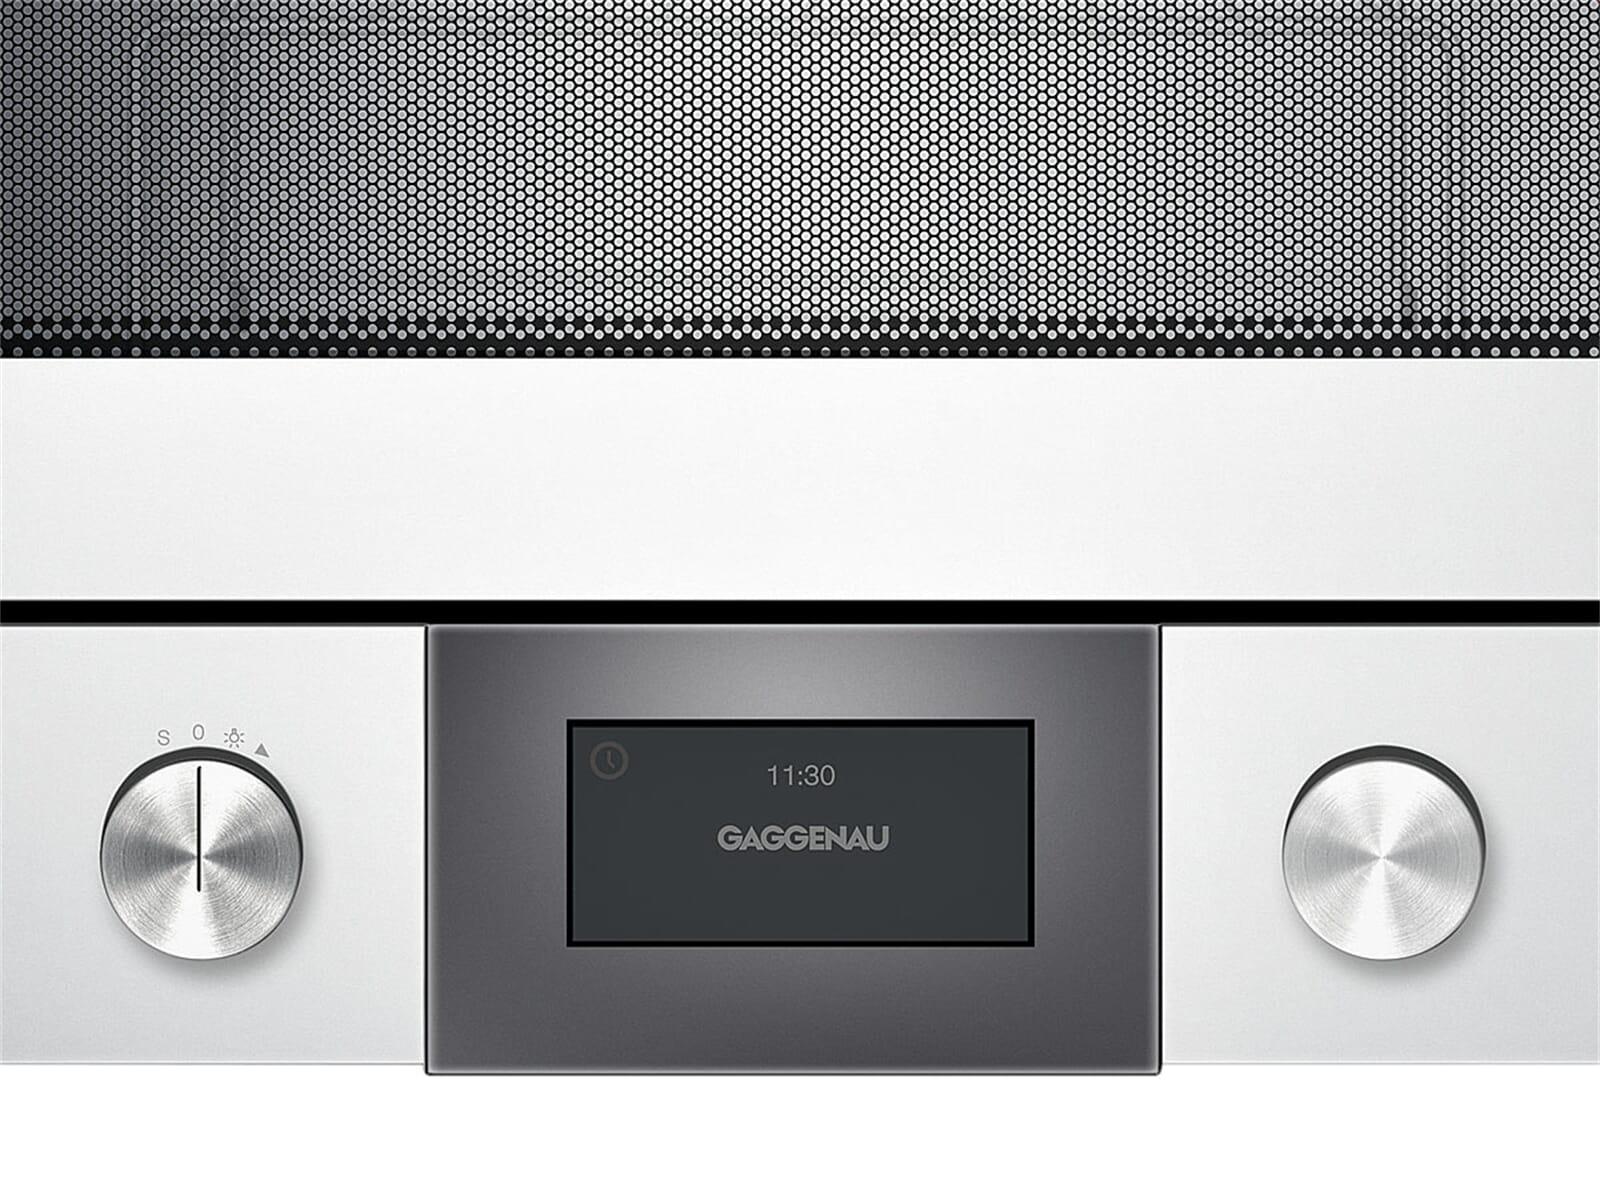 gaggenau bmp 225 130 einbau mikrowelle serie 200 silber. Black Bedroom Furniture Sets. Home Design Ideas